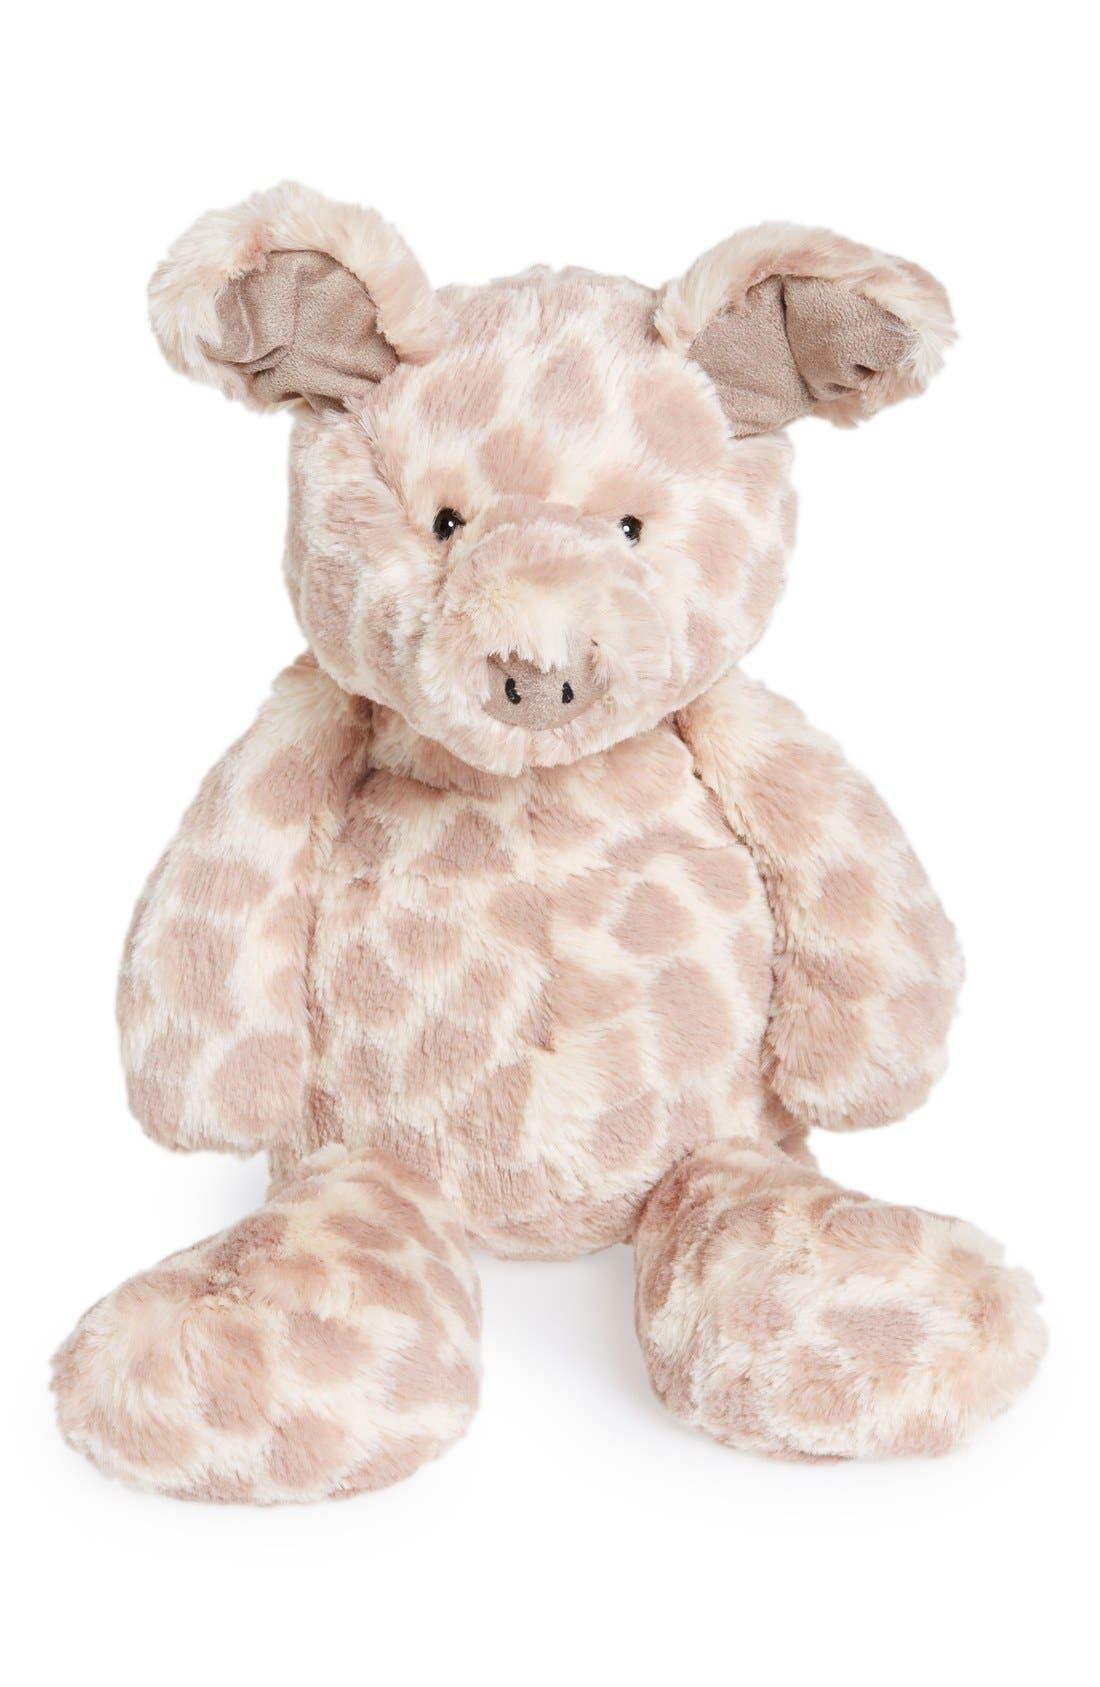 'Dapple Piglet' Stuffed Animal,                         Main,                         color, Pink